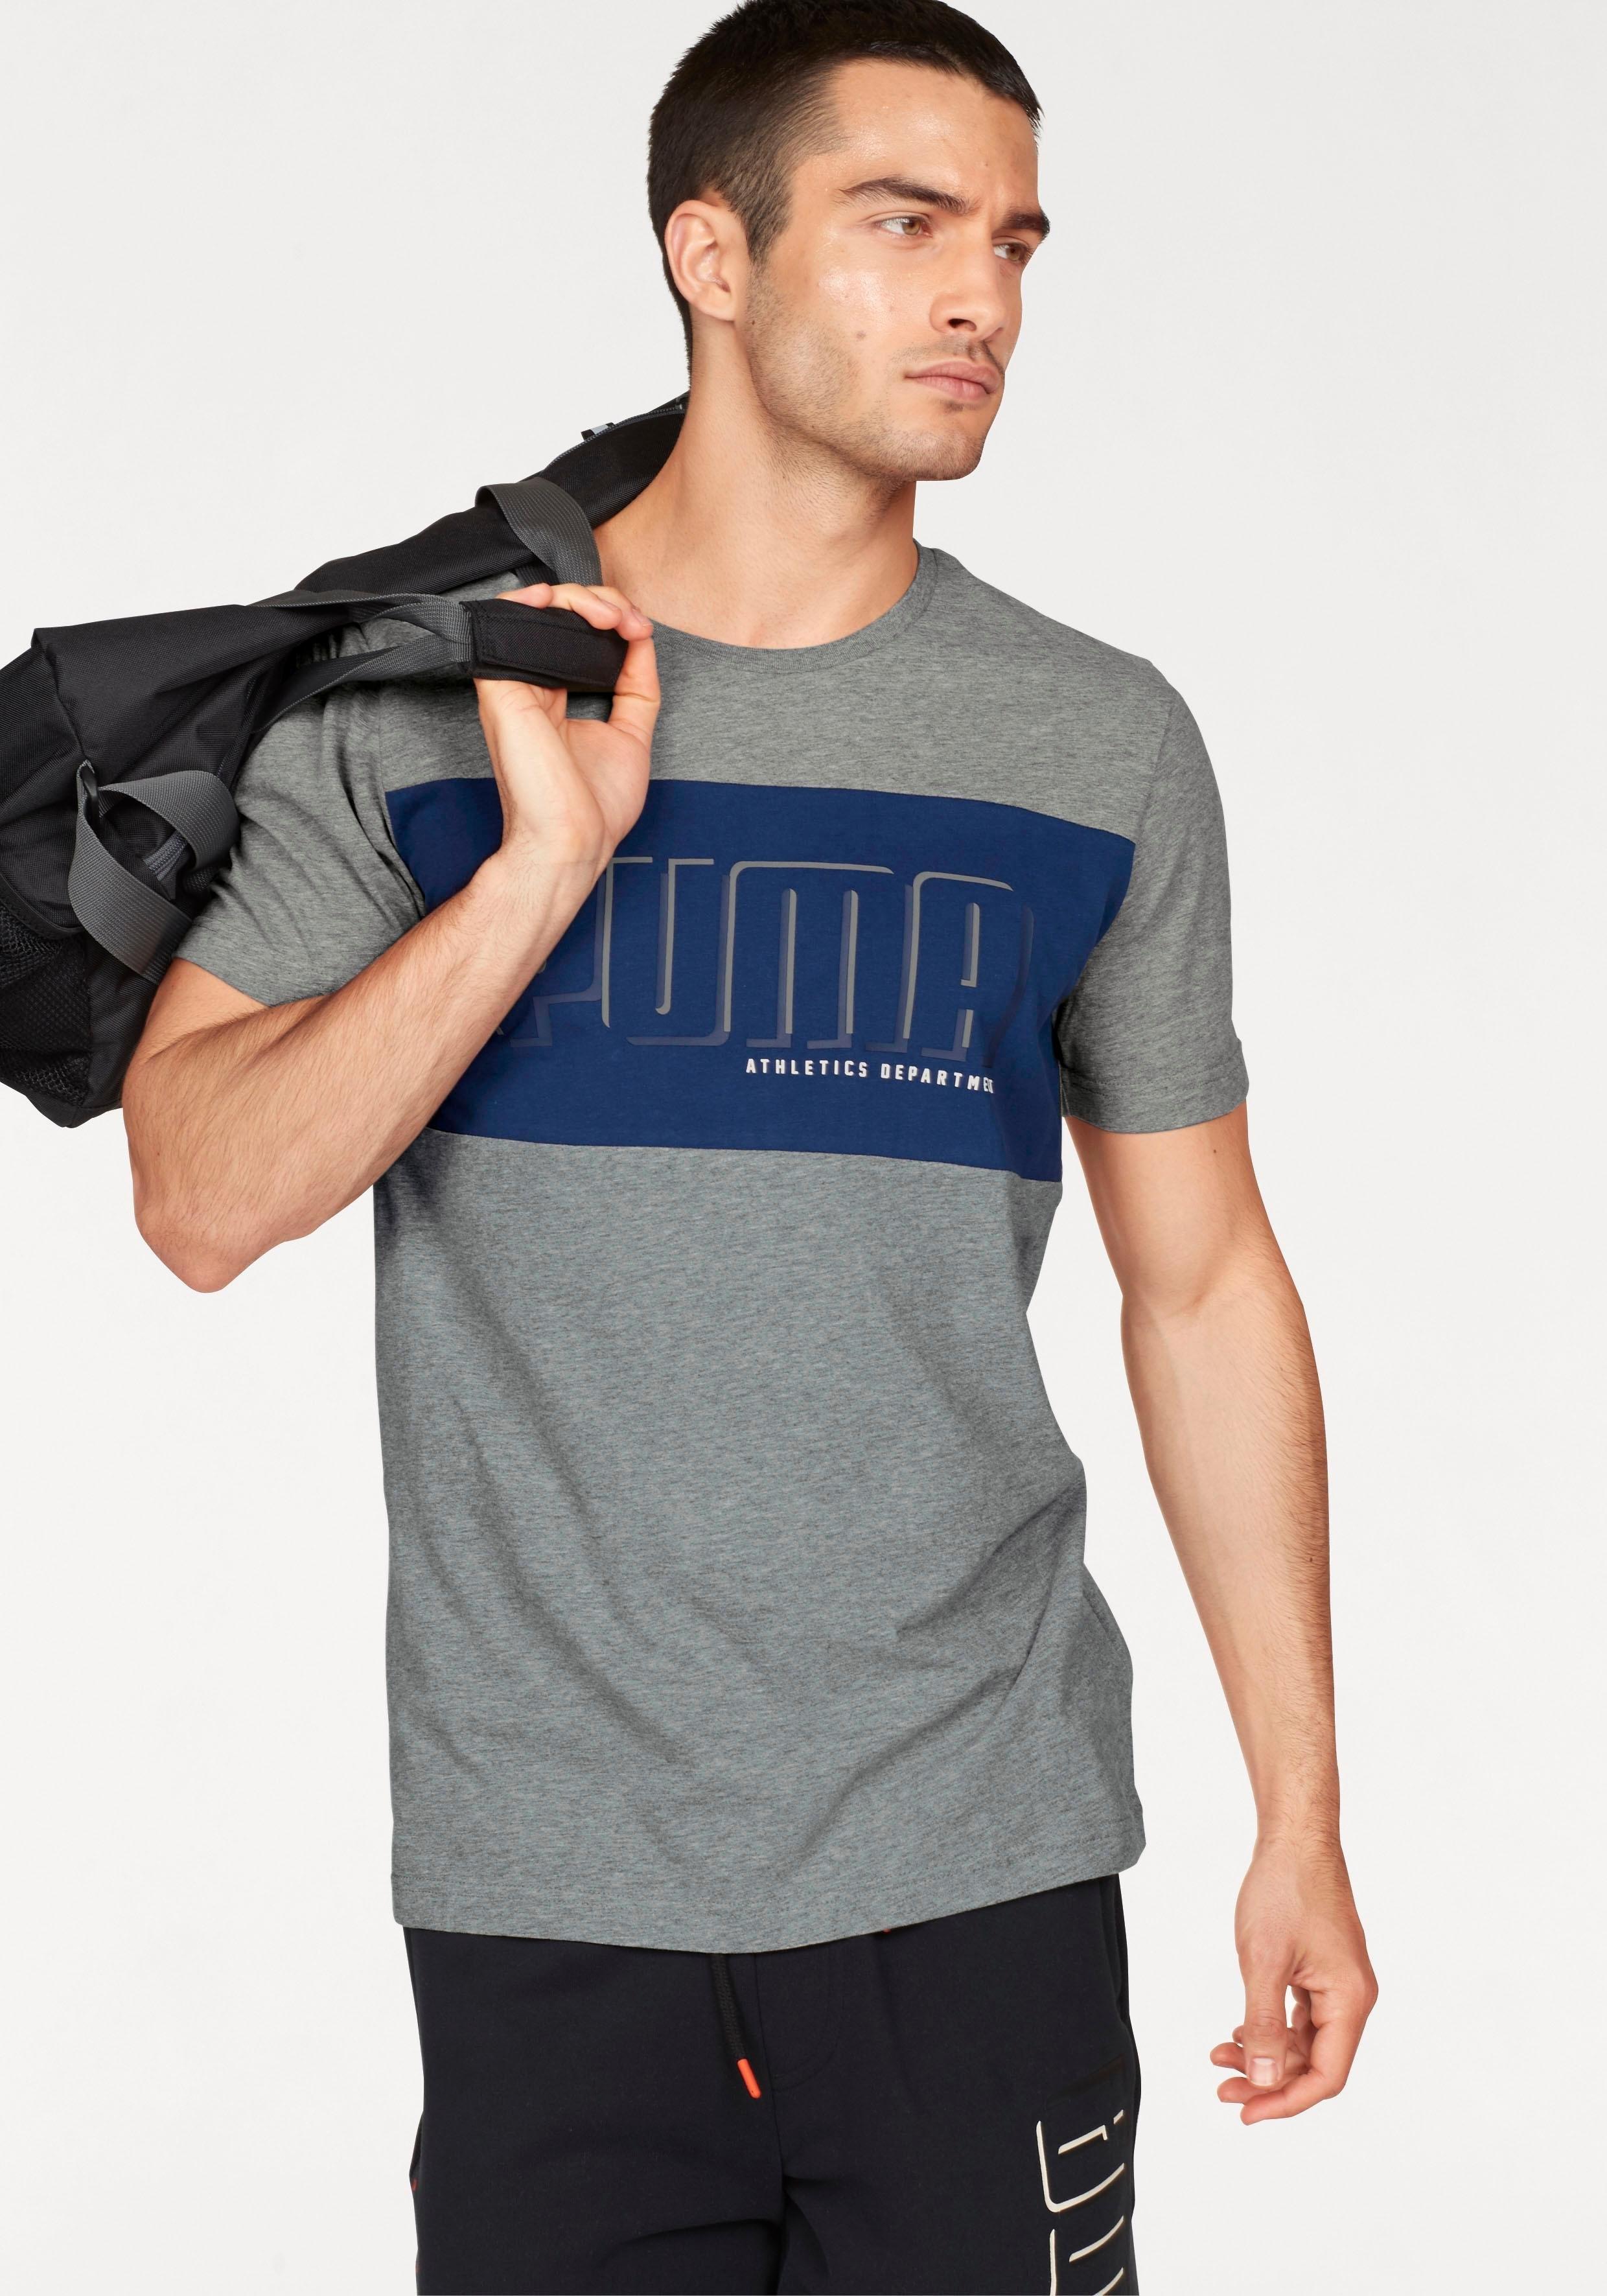 Puma Online shirtstyle T Athletics Tee Shop Graphic PwO8nXZkN0